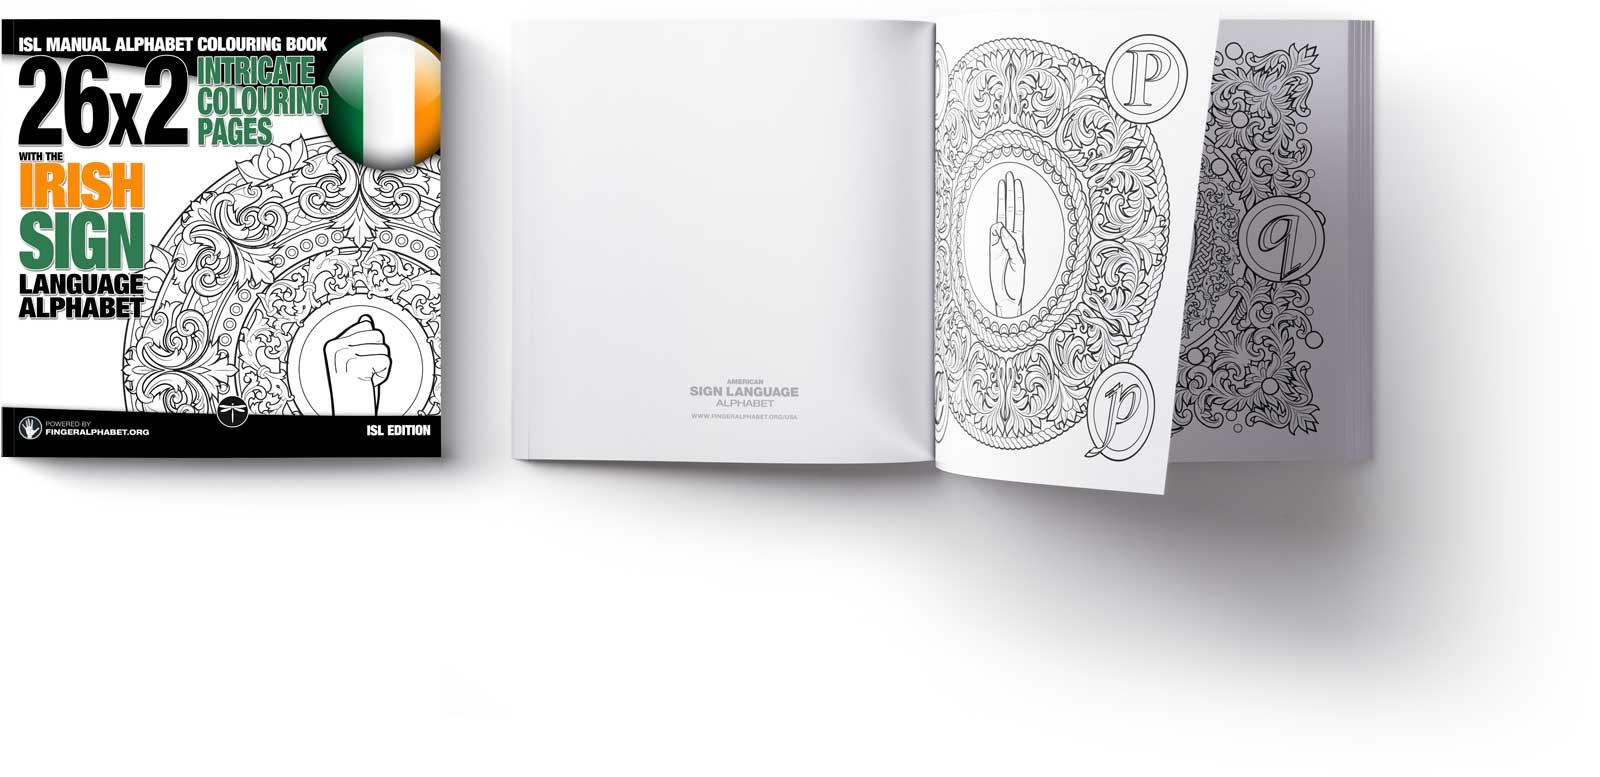 ISL Alphabet Colouring Book